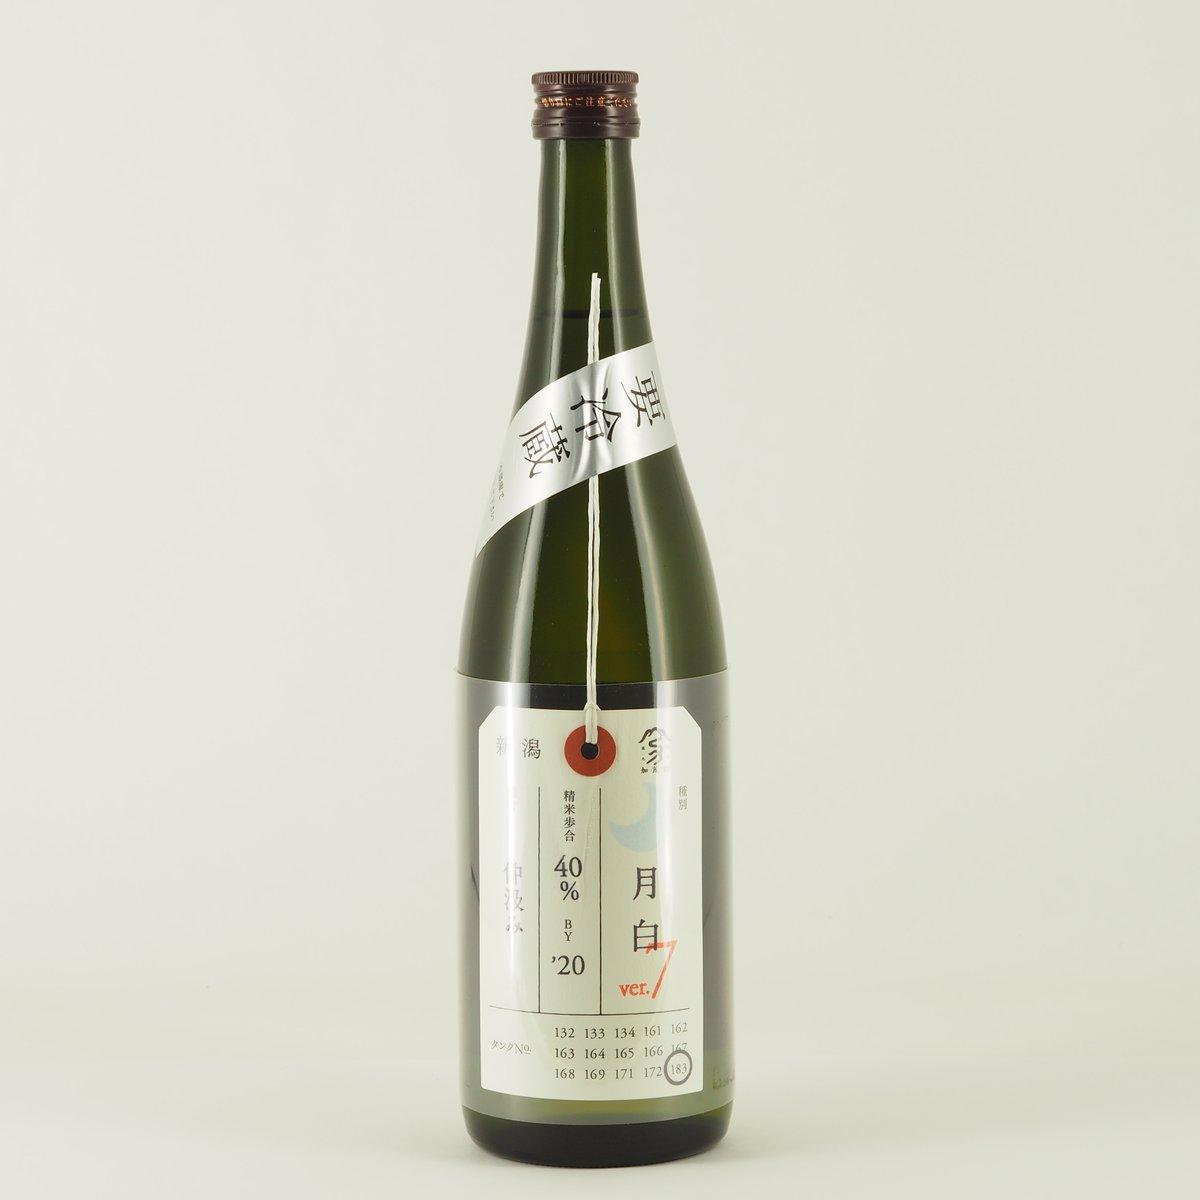 test ツイッターメディア - 【日本酒】 加茂錦 荷札酒 月白 純米大吟醸 再入荷致しました!  淡麗で辛口。 爽やかな香味、シンプルな日本的色彩を お楽しみいただければ幸いです。  詳しくはブログで! https://t.co/czhNqflTbo オンラインショップ https://t.co/O5AK9iFhl6 https://t.co/0DHp7G6MlN